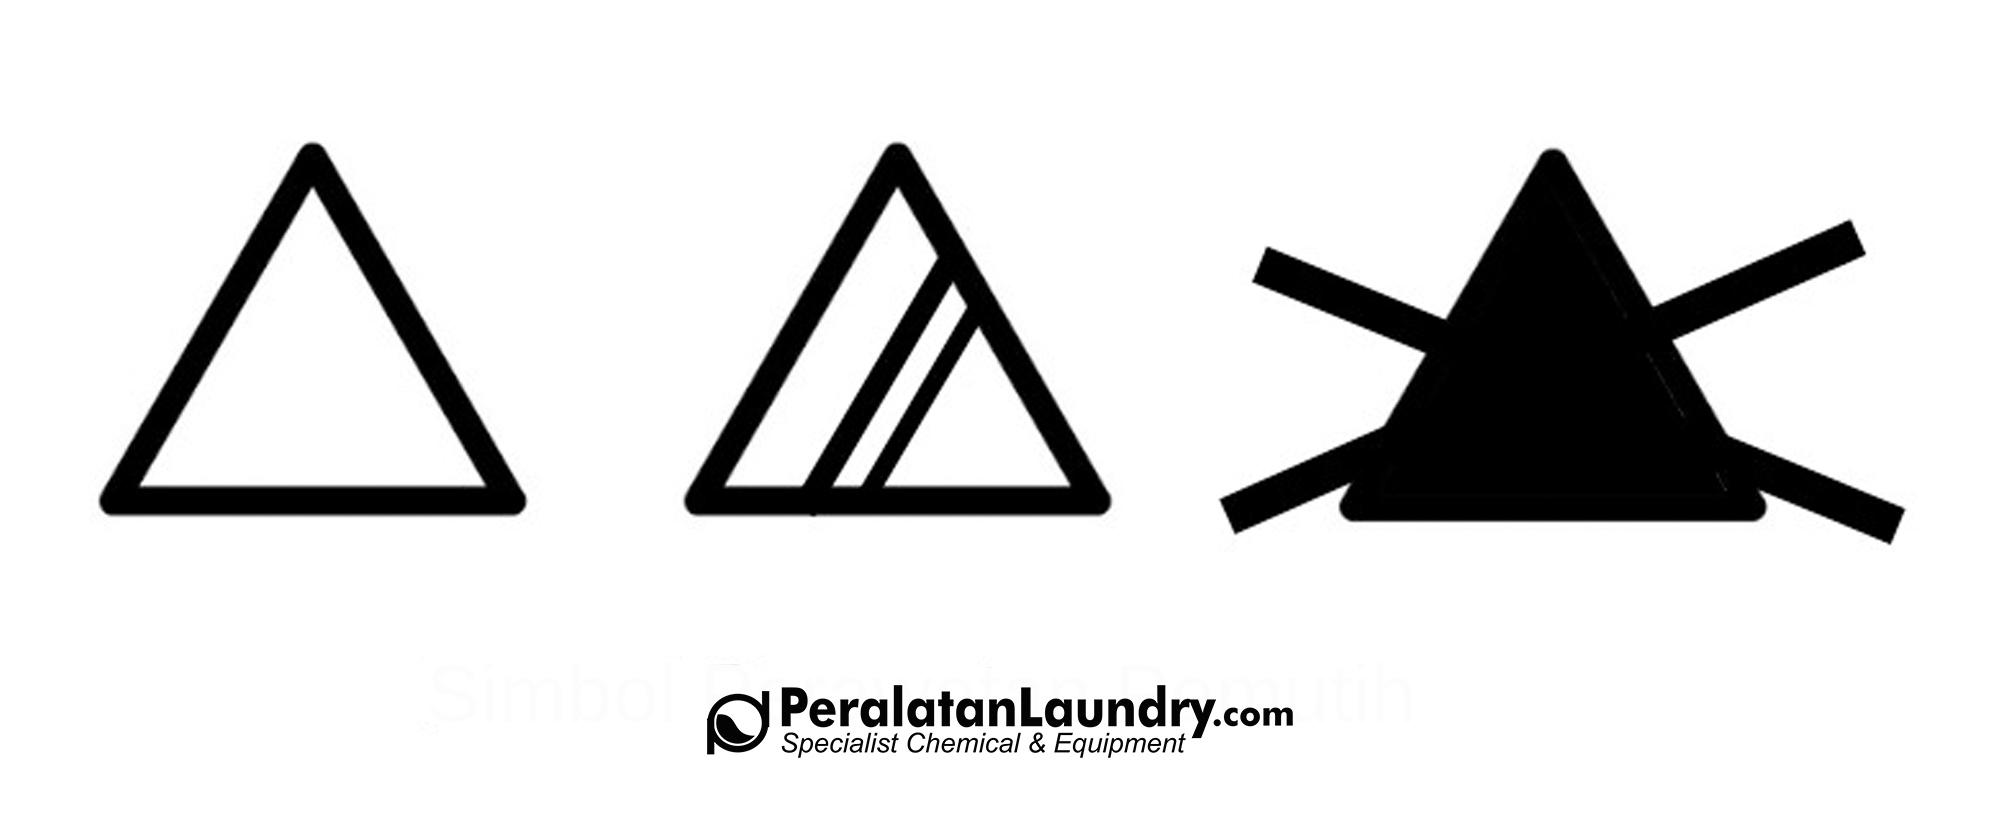 simbol bleaching perawatan pakaian